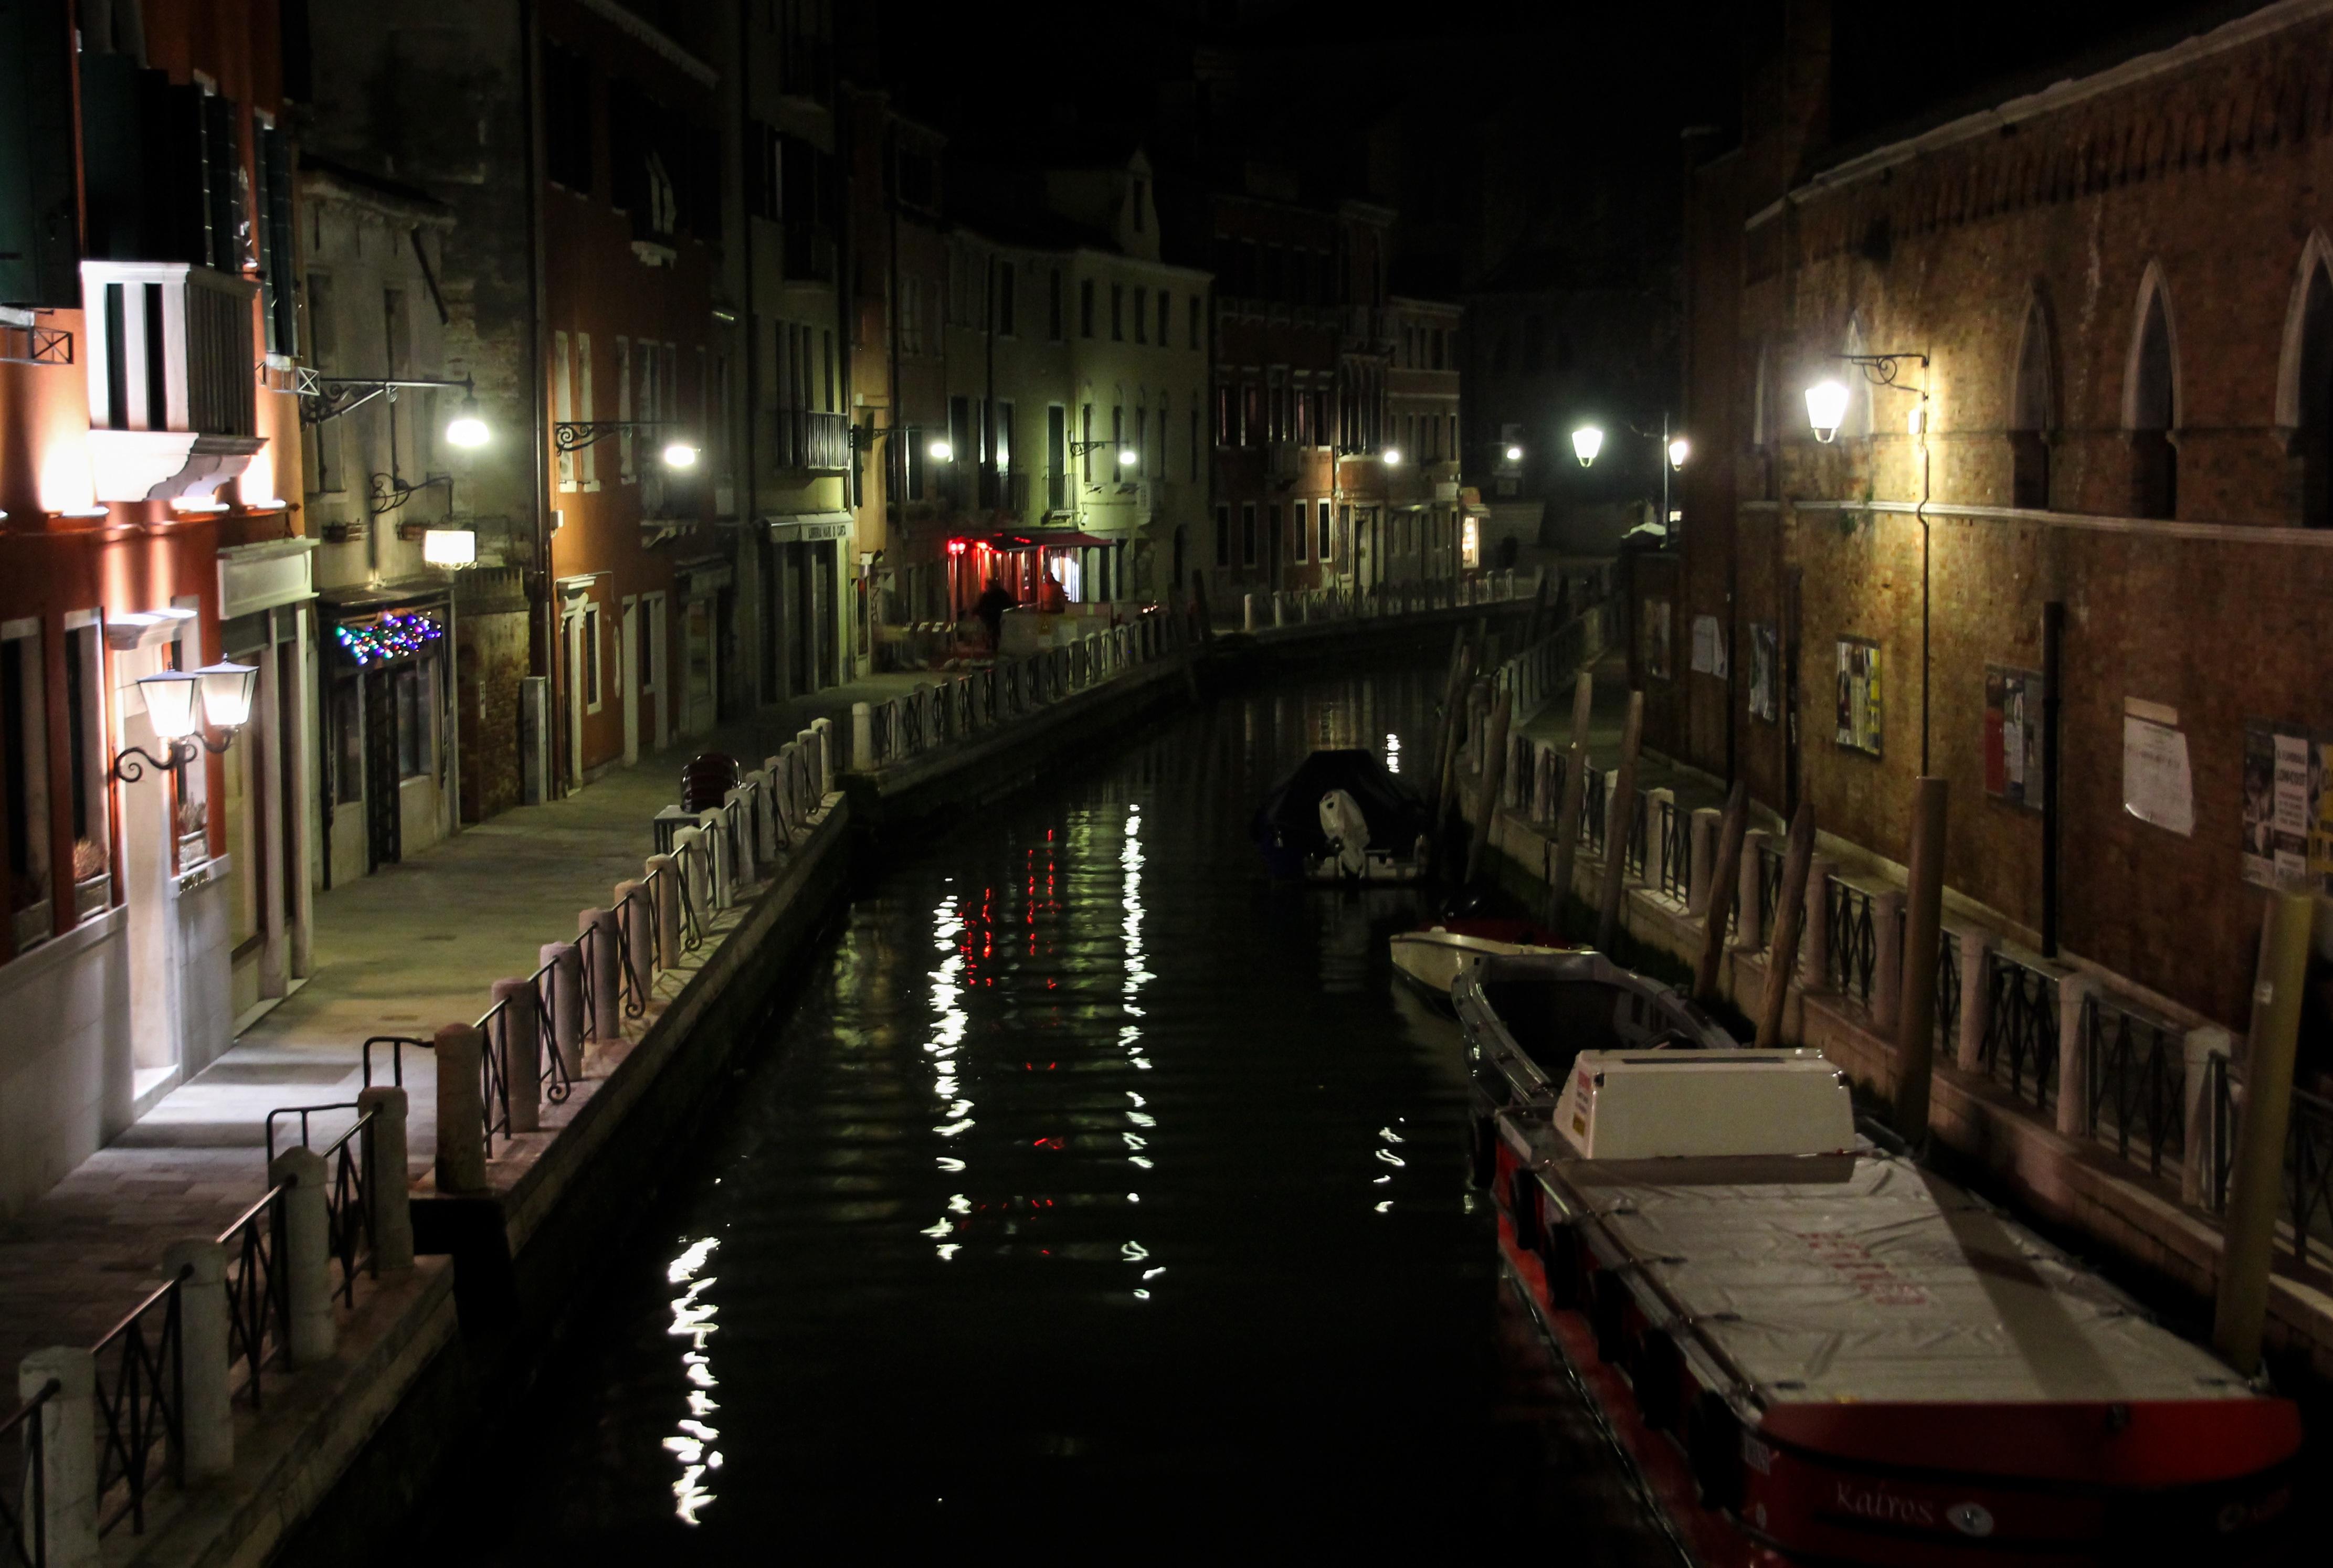 Channel through the City, Architecture, Boat, Bridge, Building, HQ Photo